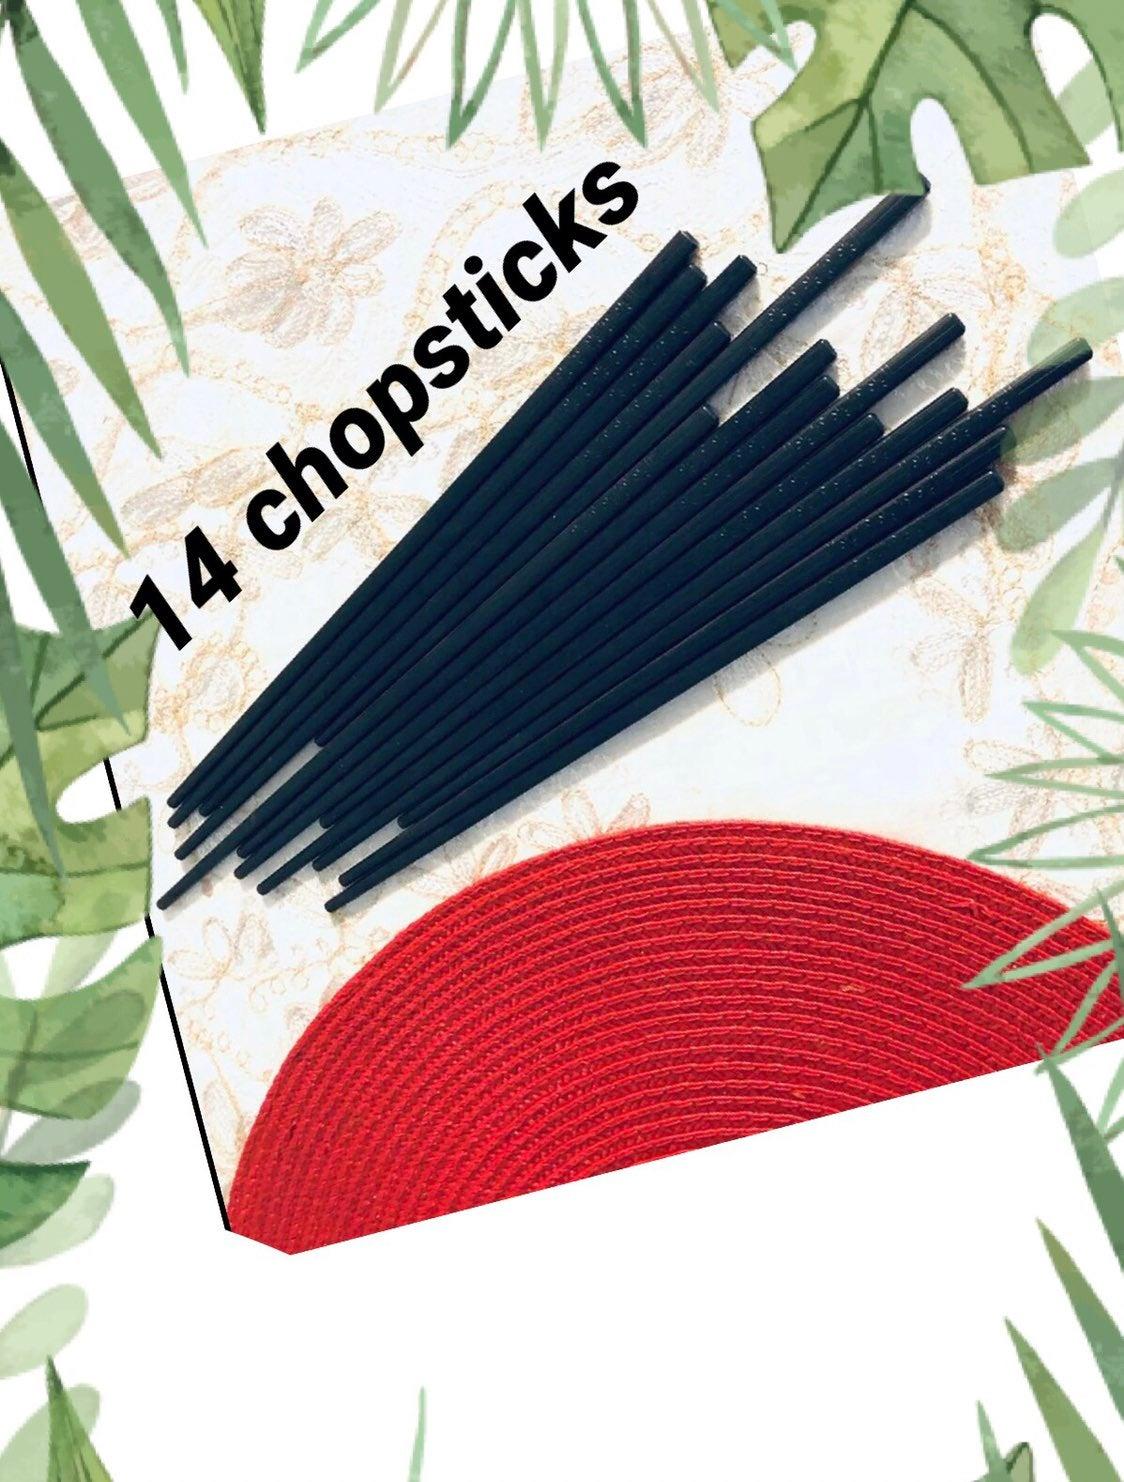 Chopsticks - set of 14